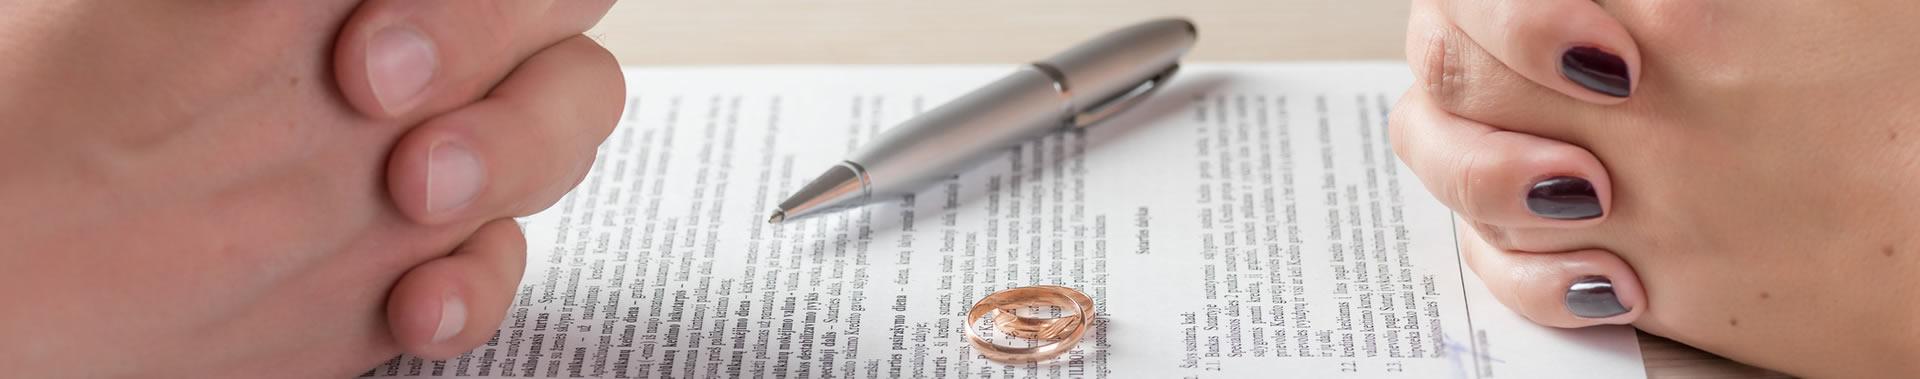 Treasure Coast Legal | Family Law Attorneys | Personal